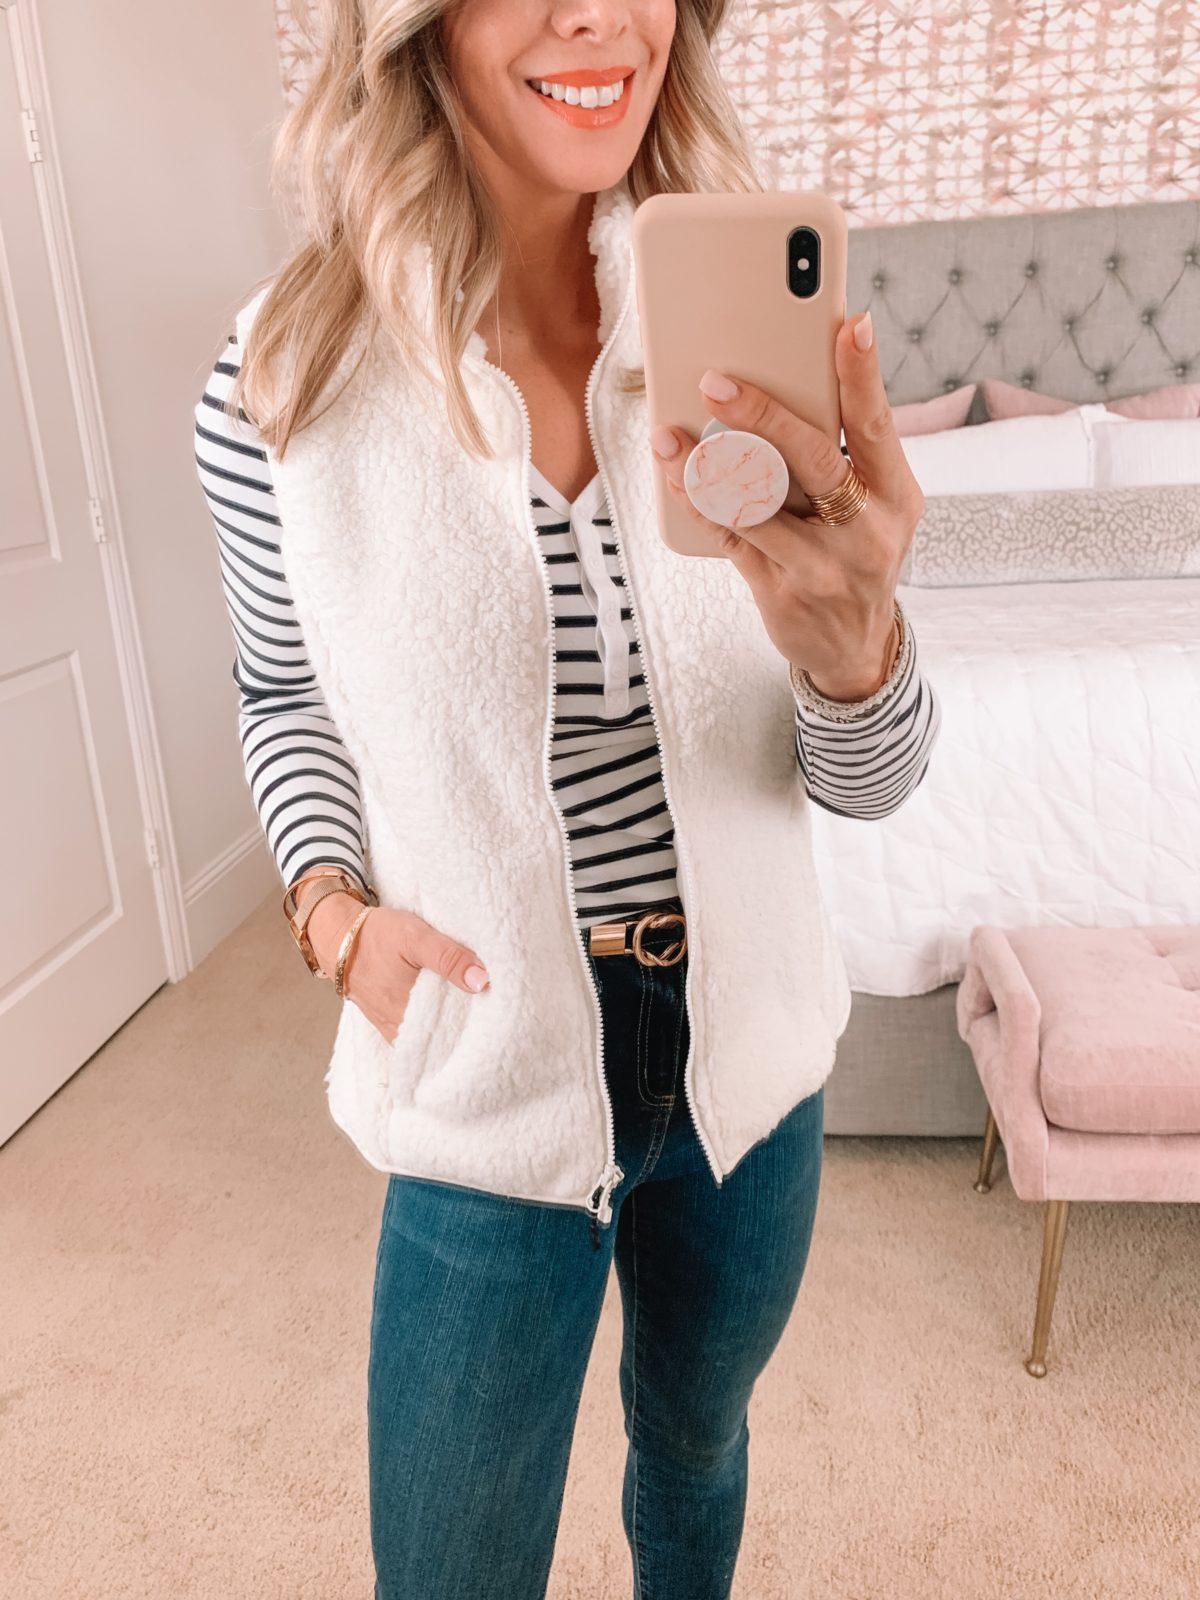 Amazon Capsule Wardrobe, Stripe Tee, Fuzzy Vest, Skinny Jeans, Belt